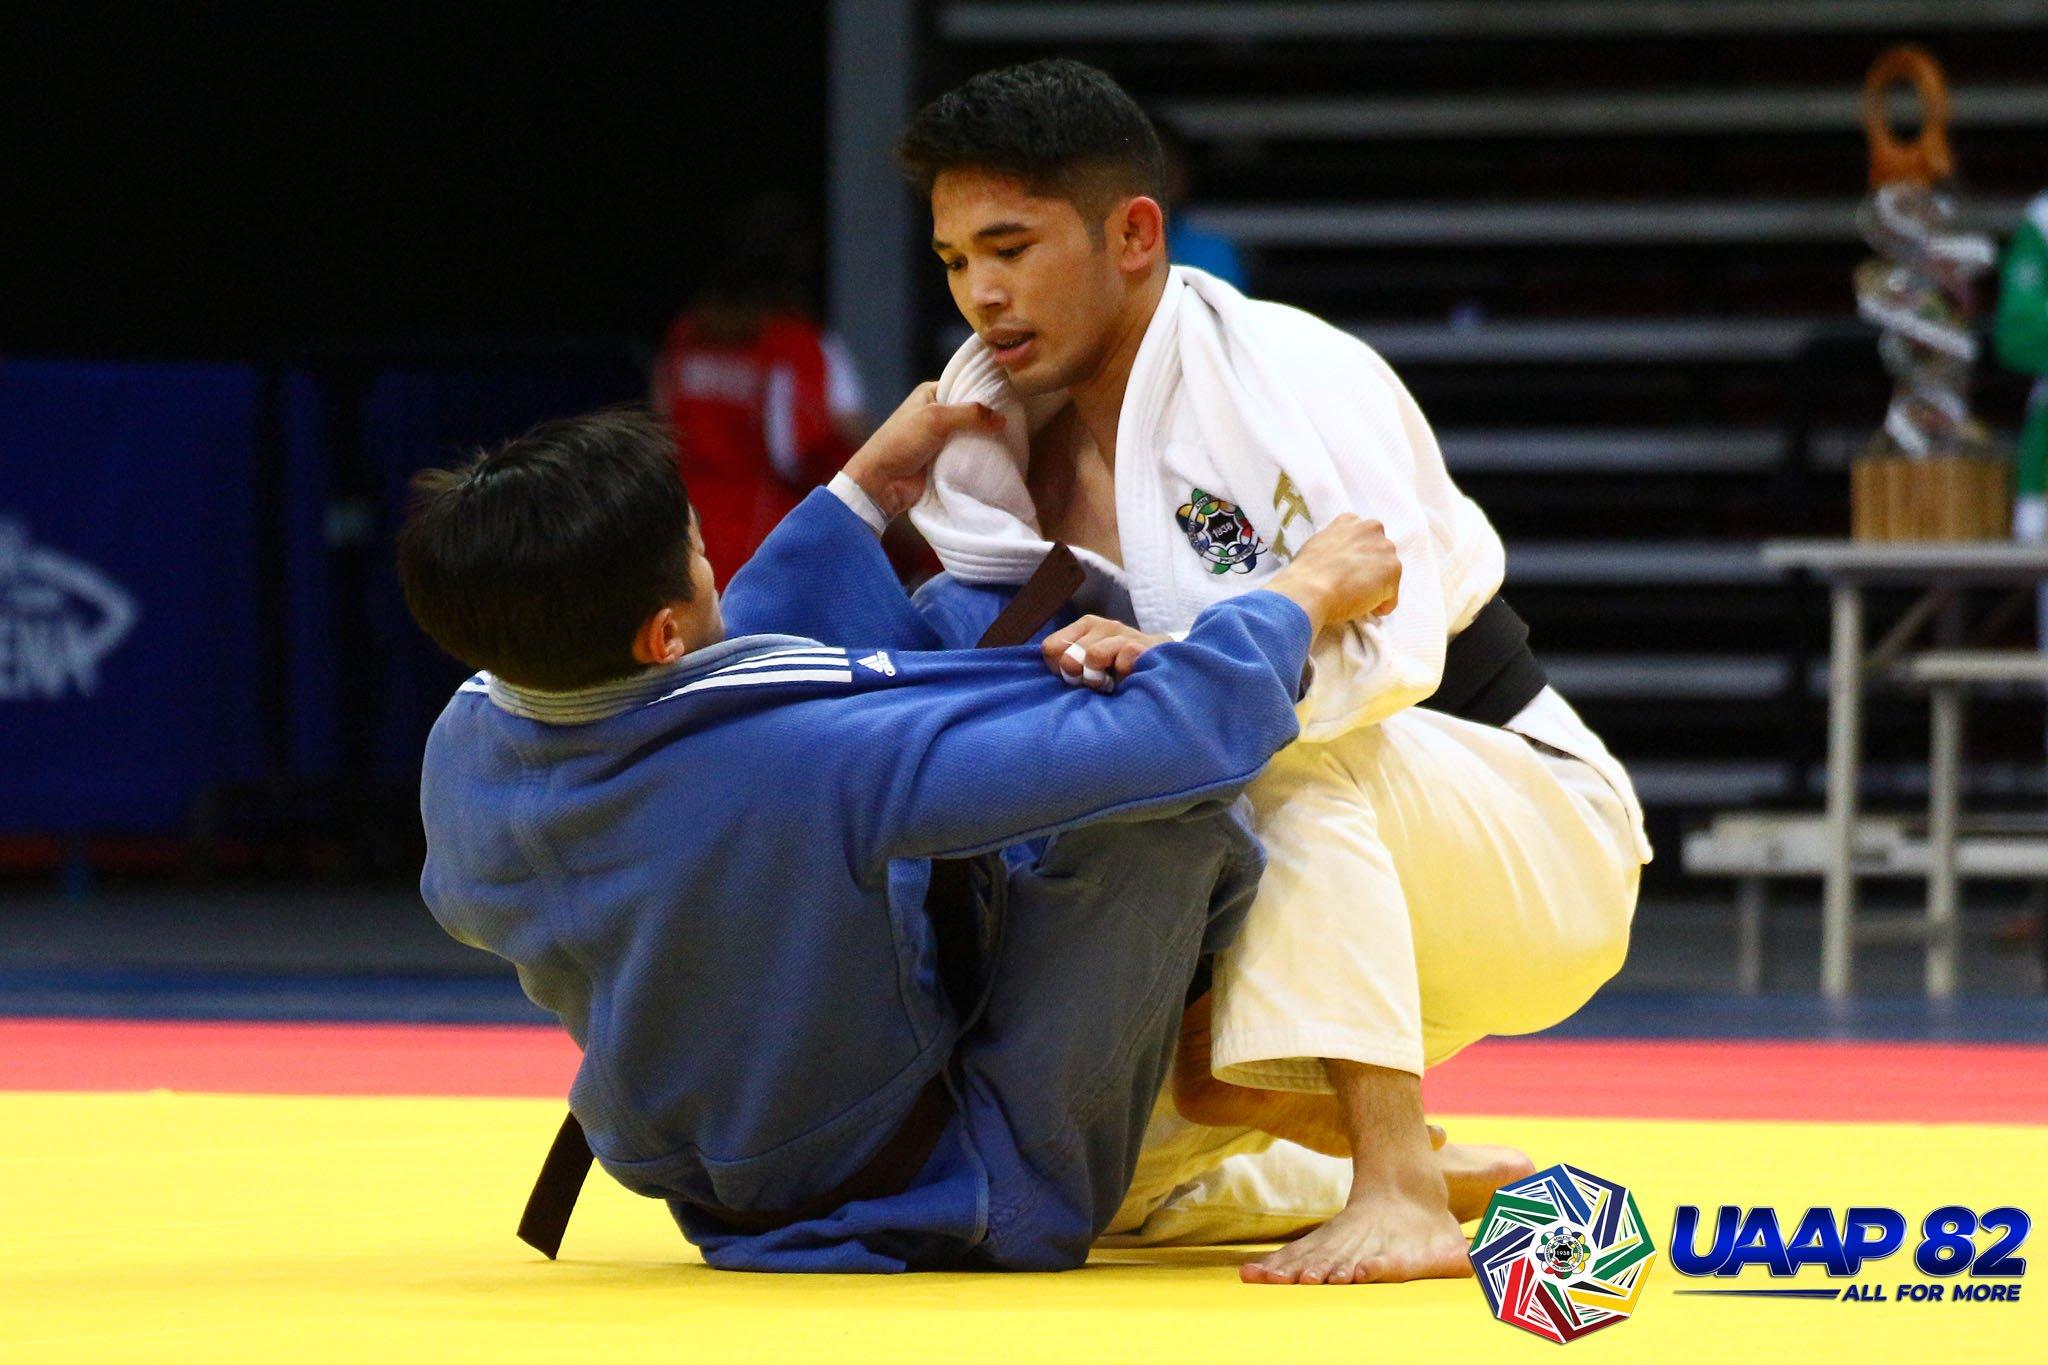 UAAP-82-Mens-Judo-Minus-60-ELW-Final-UST-v-UP-Lorenzo-3 Rookie Ligero, senior Lorenzo lift UST to UAAP Judo four-peat ADMU Judo News UAAP UP UST  - philippine sports news